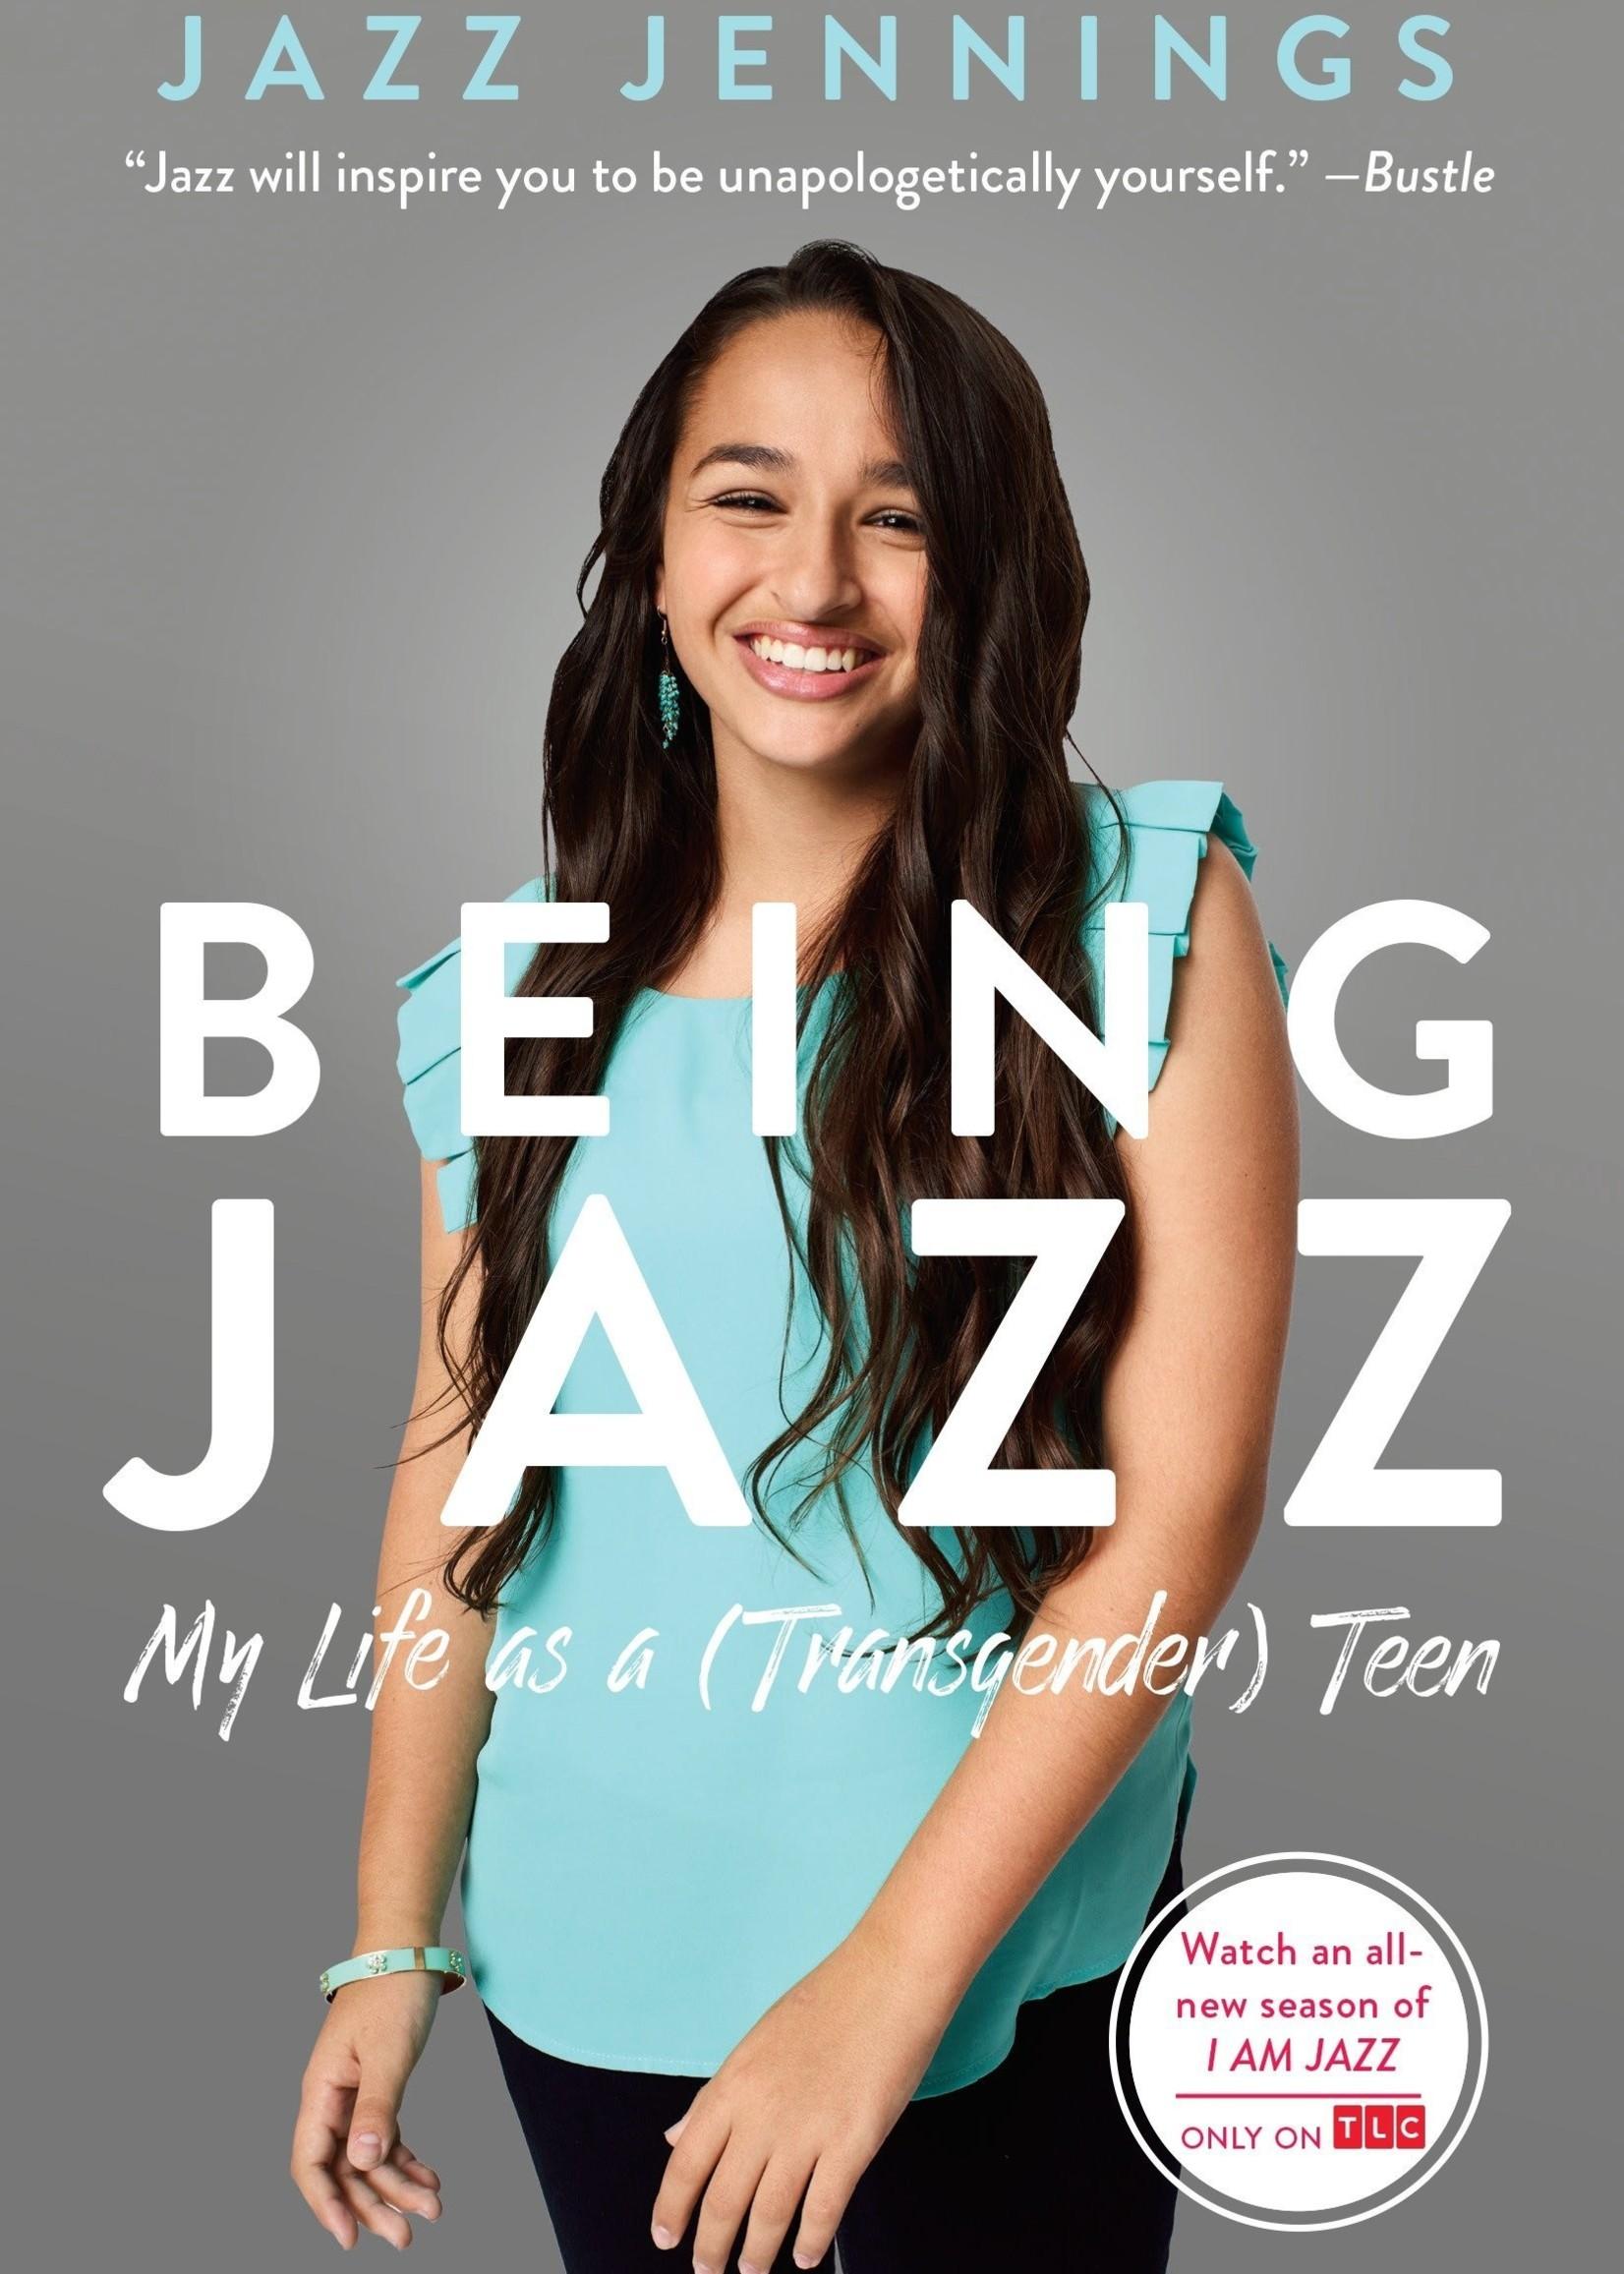 Being Jazz, My Life as a (Transgender) Teen - Paperback